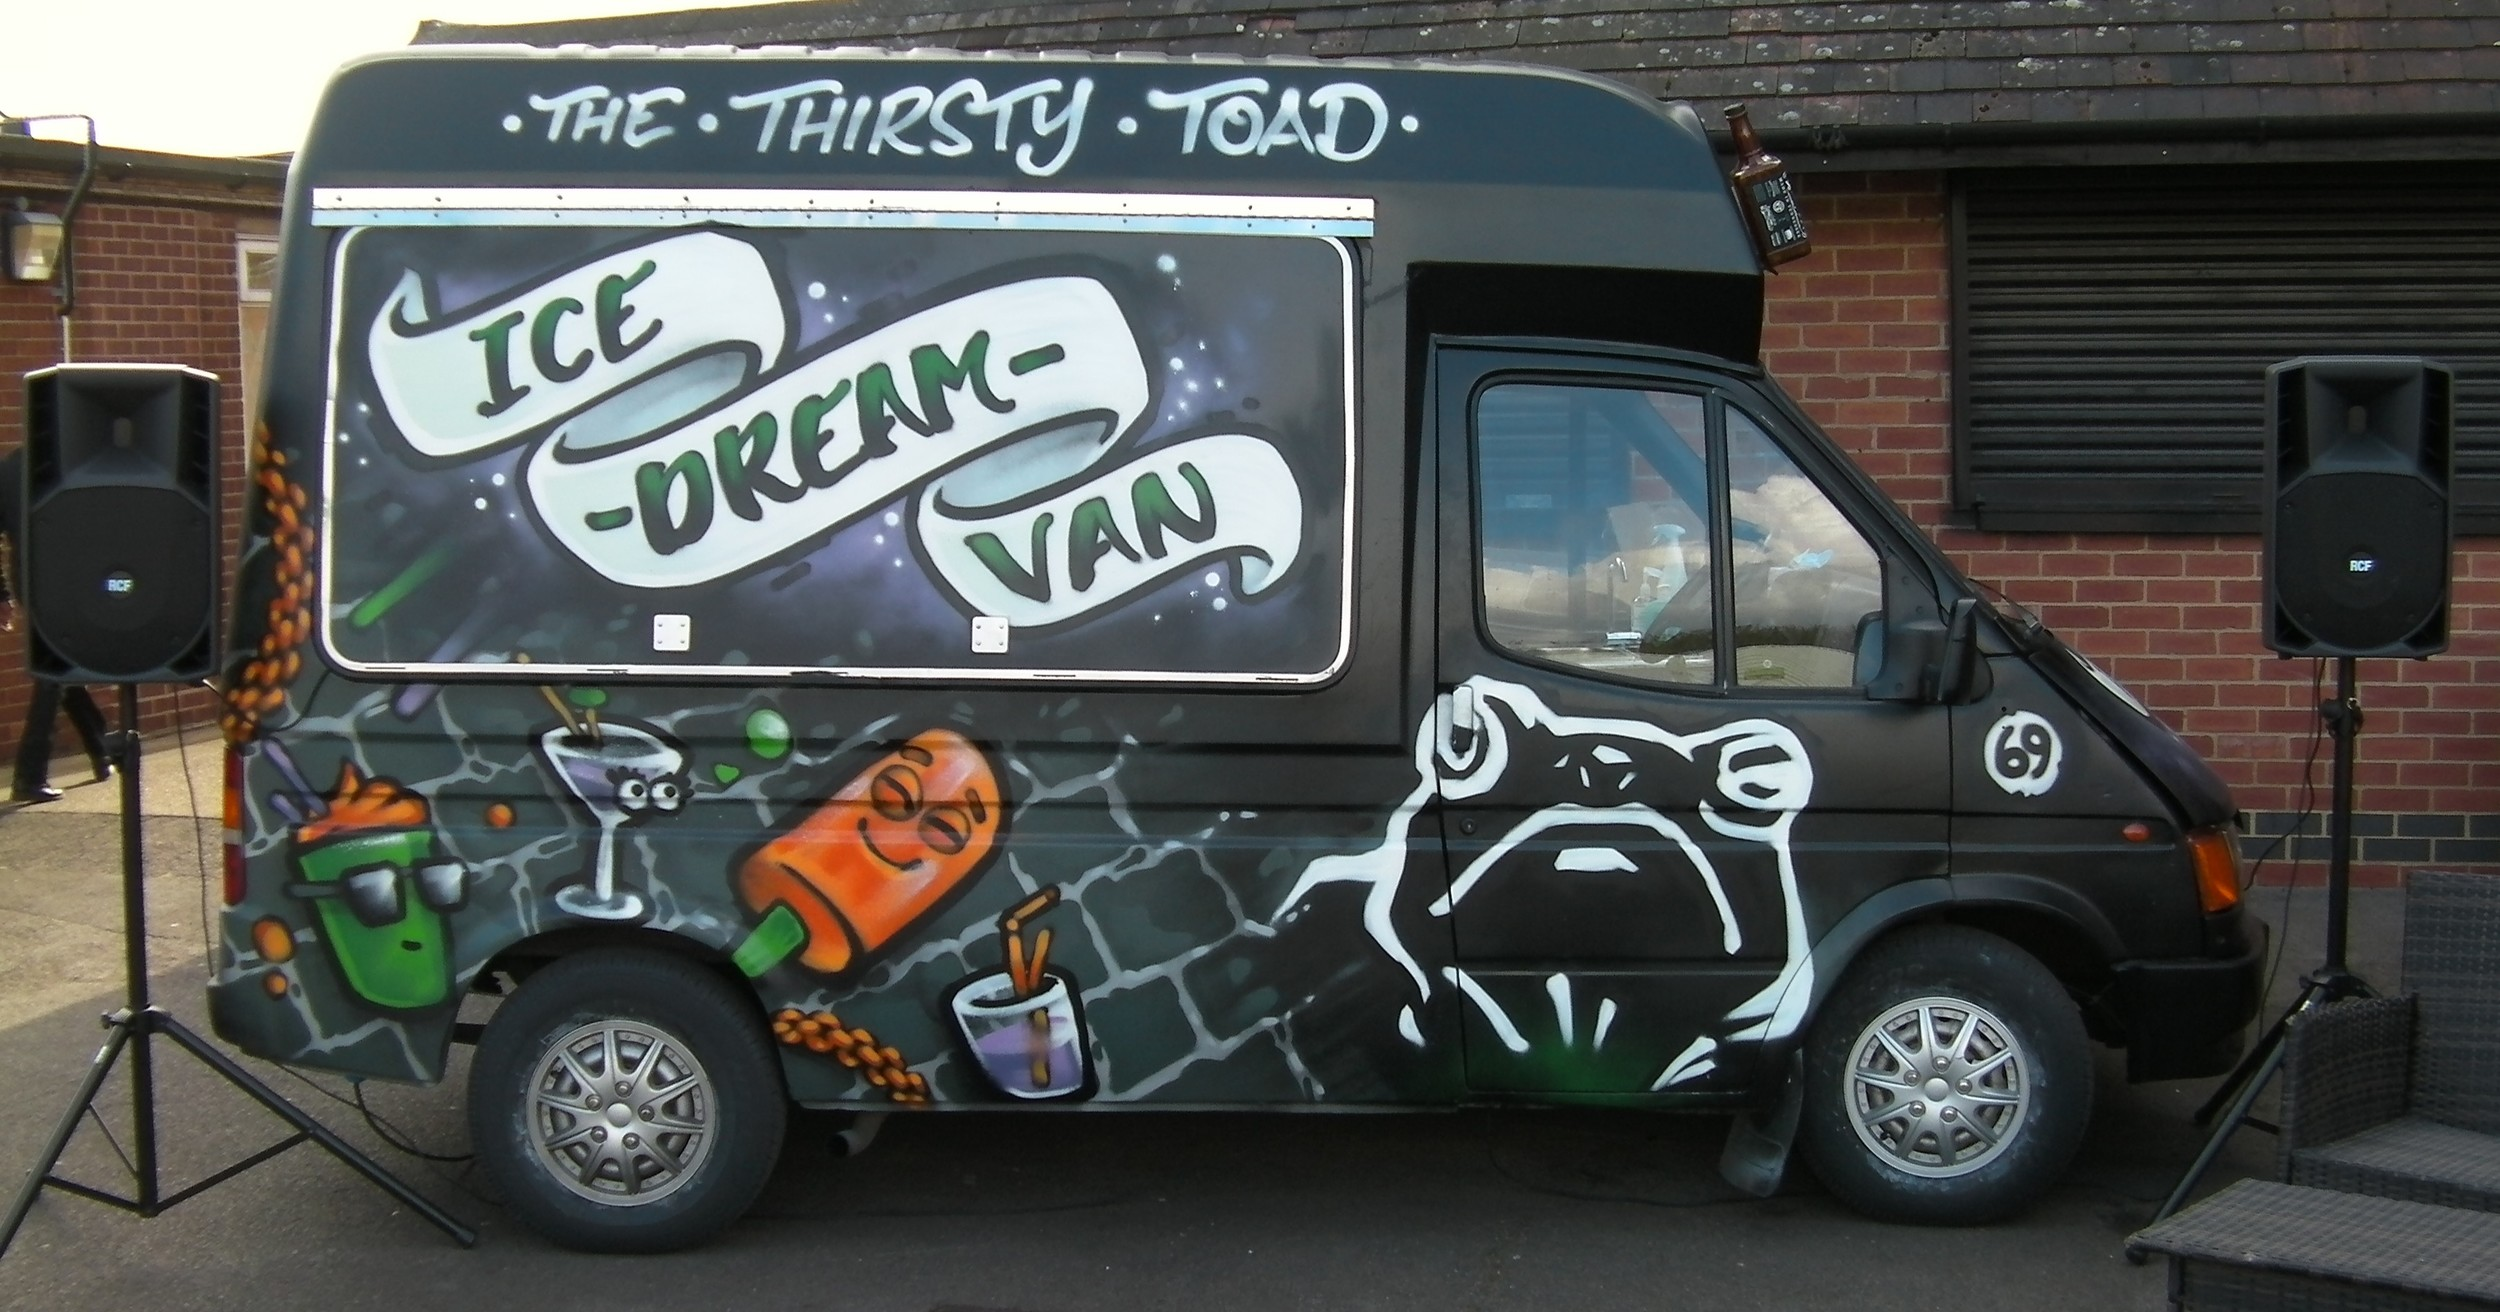 Hungry Toad Hut & Snack Van